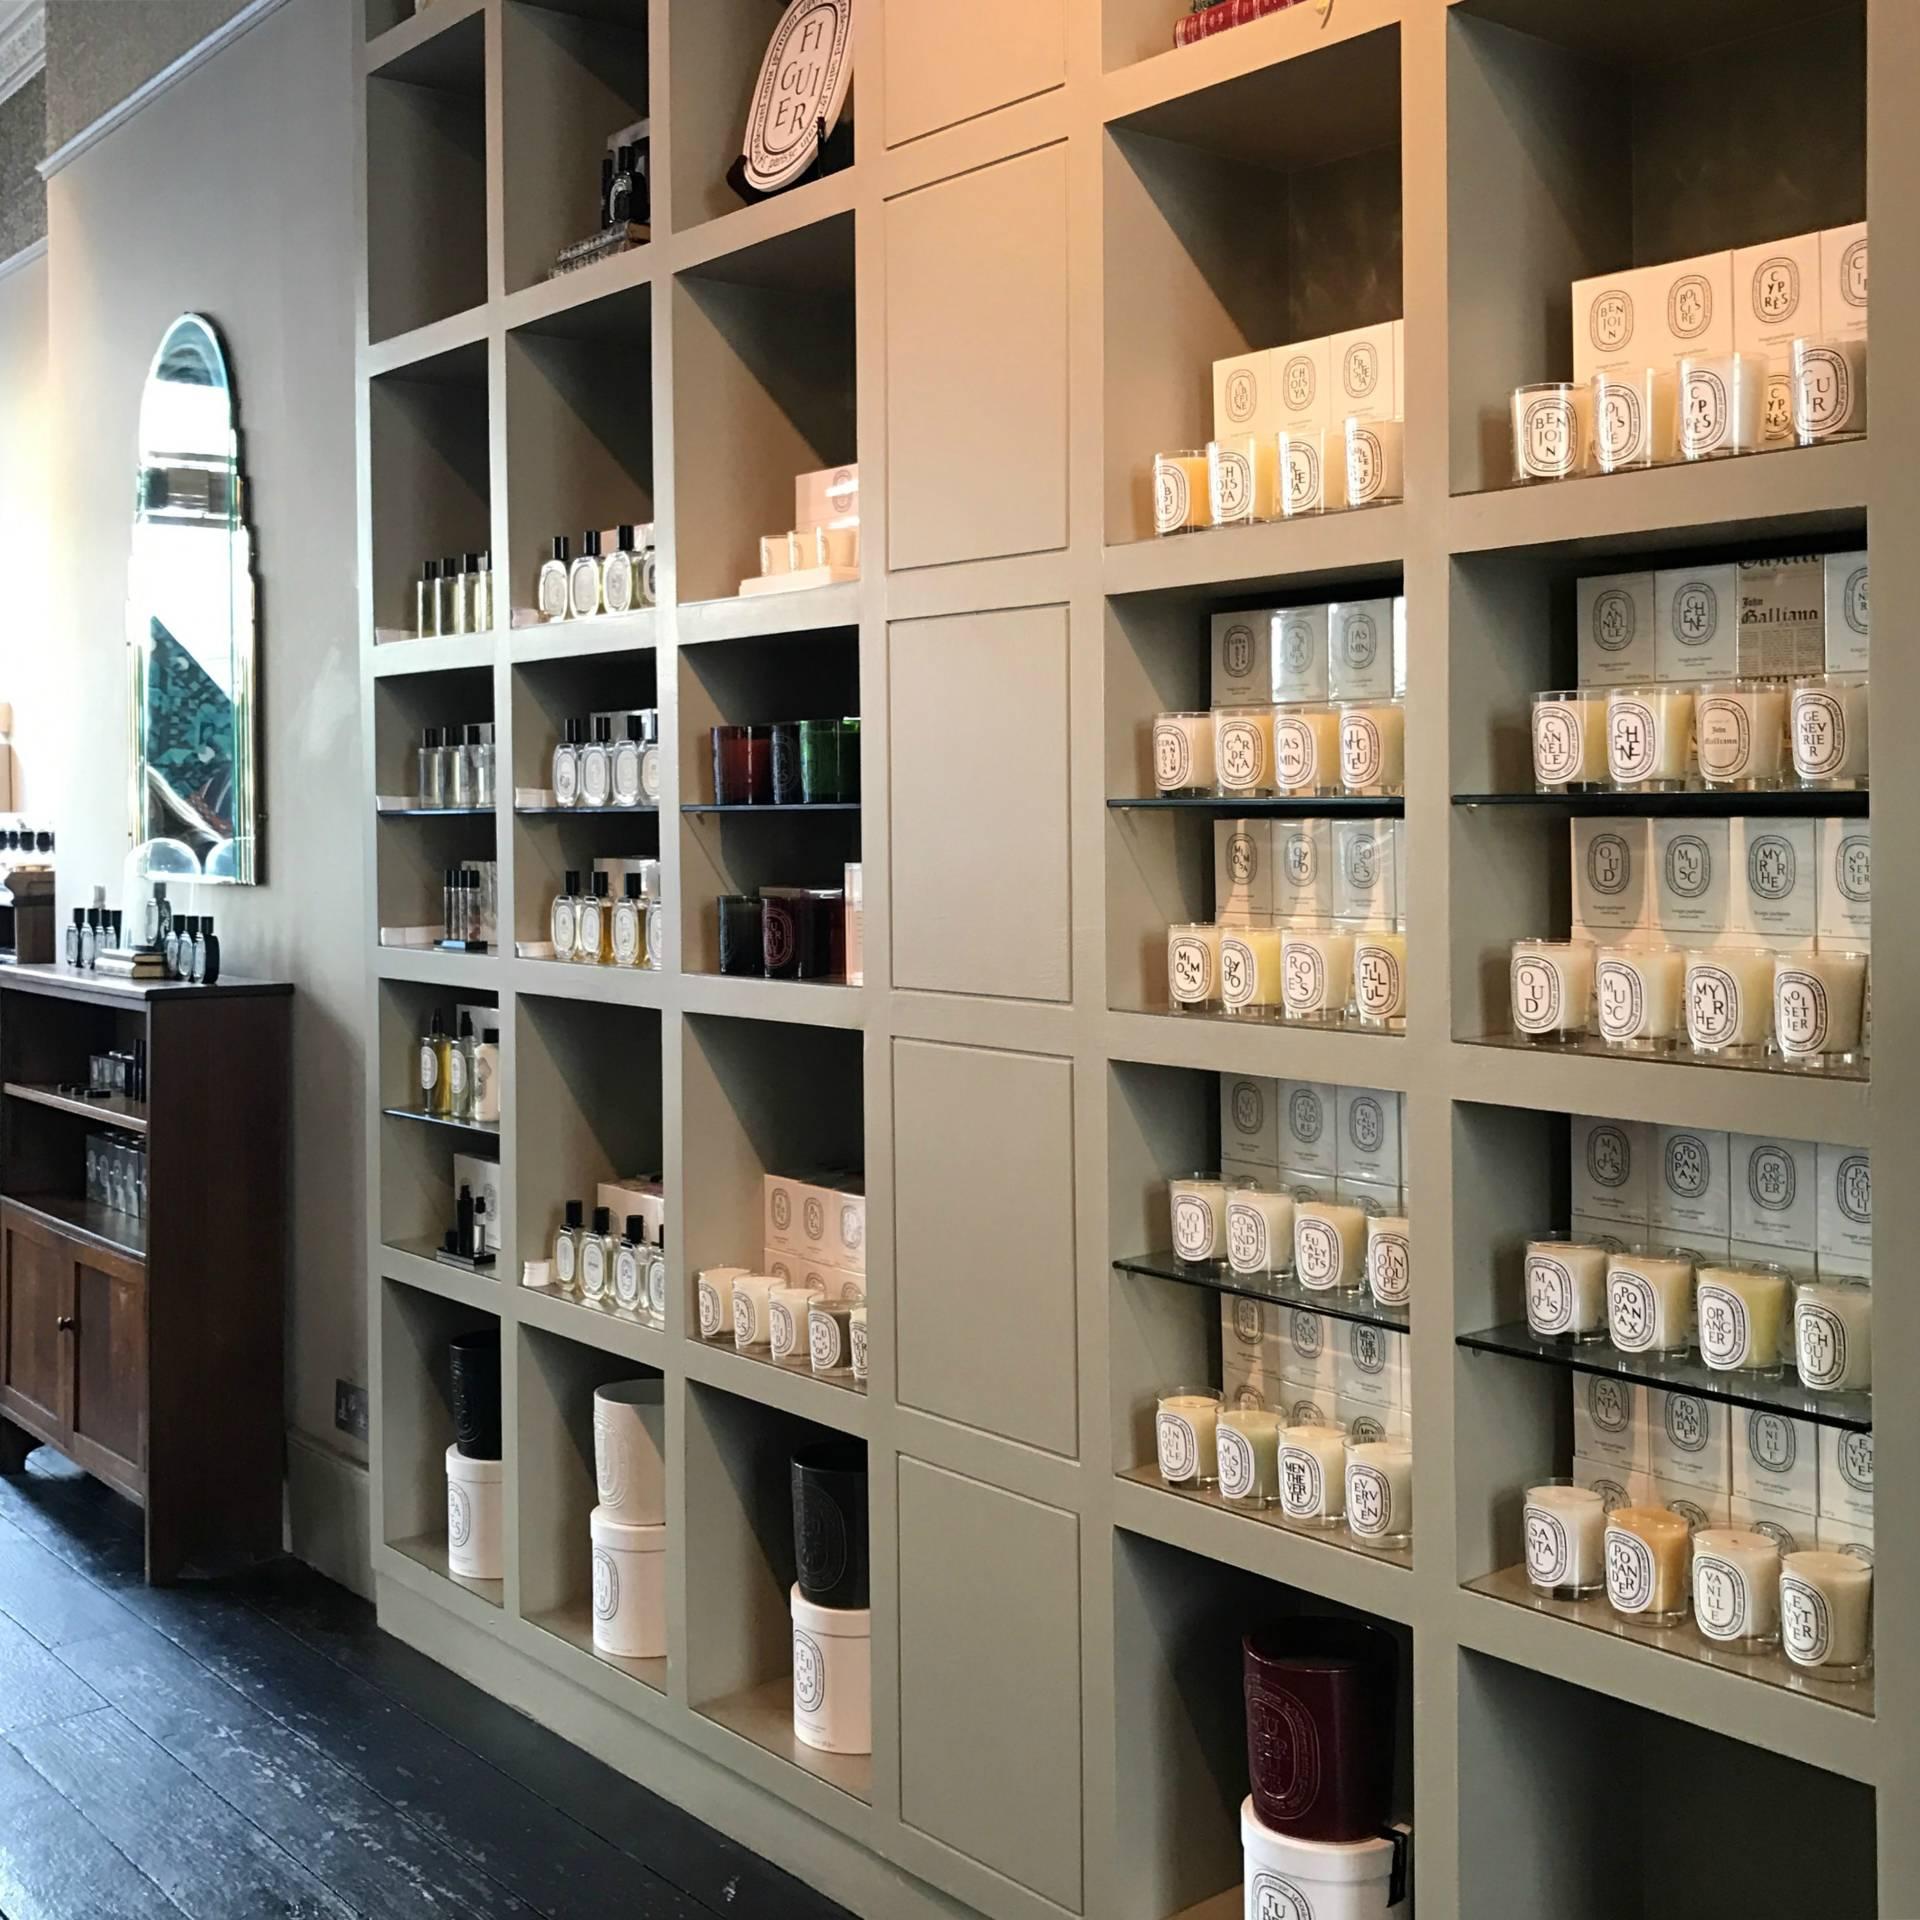 diptyque-london-notting-hill-store-visit-inhautepursuit-shopping-travel-haul